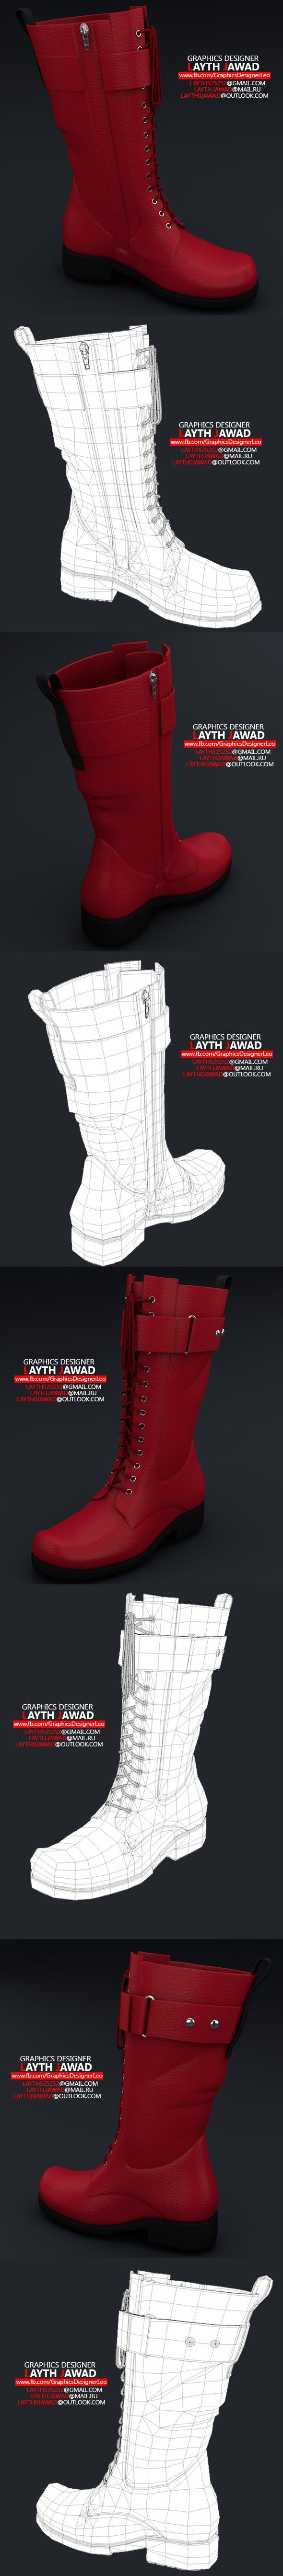 Long Women Shoes Boot 3d models - 3DOcean Item for Sale